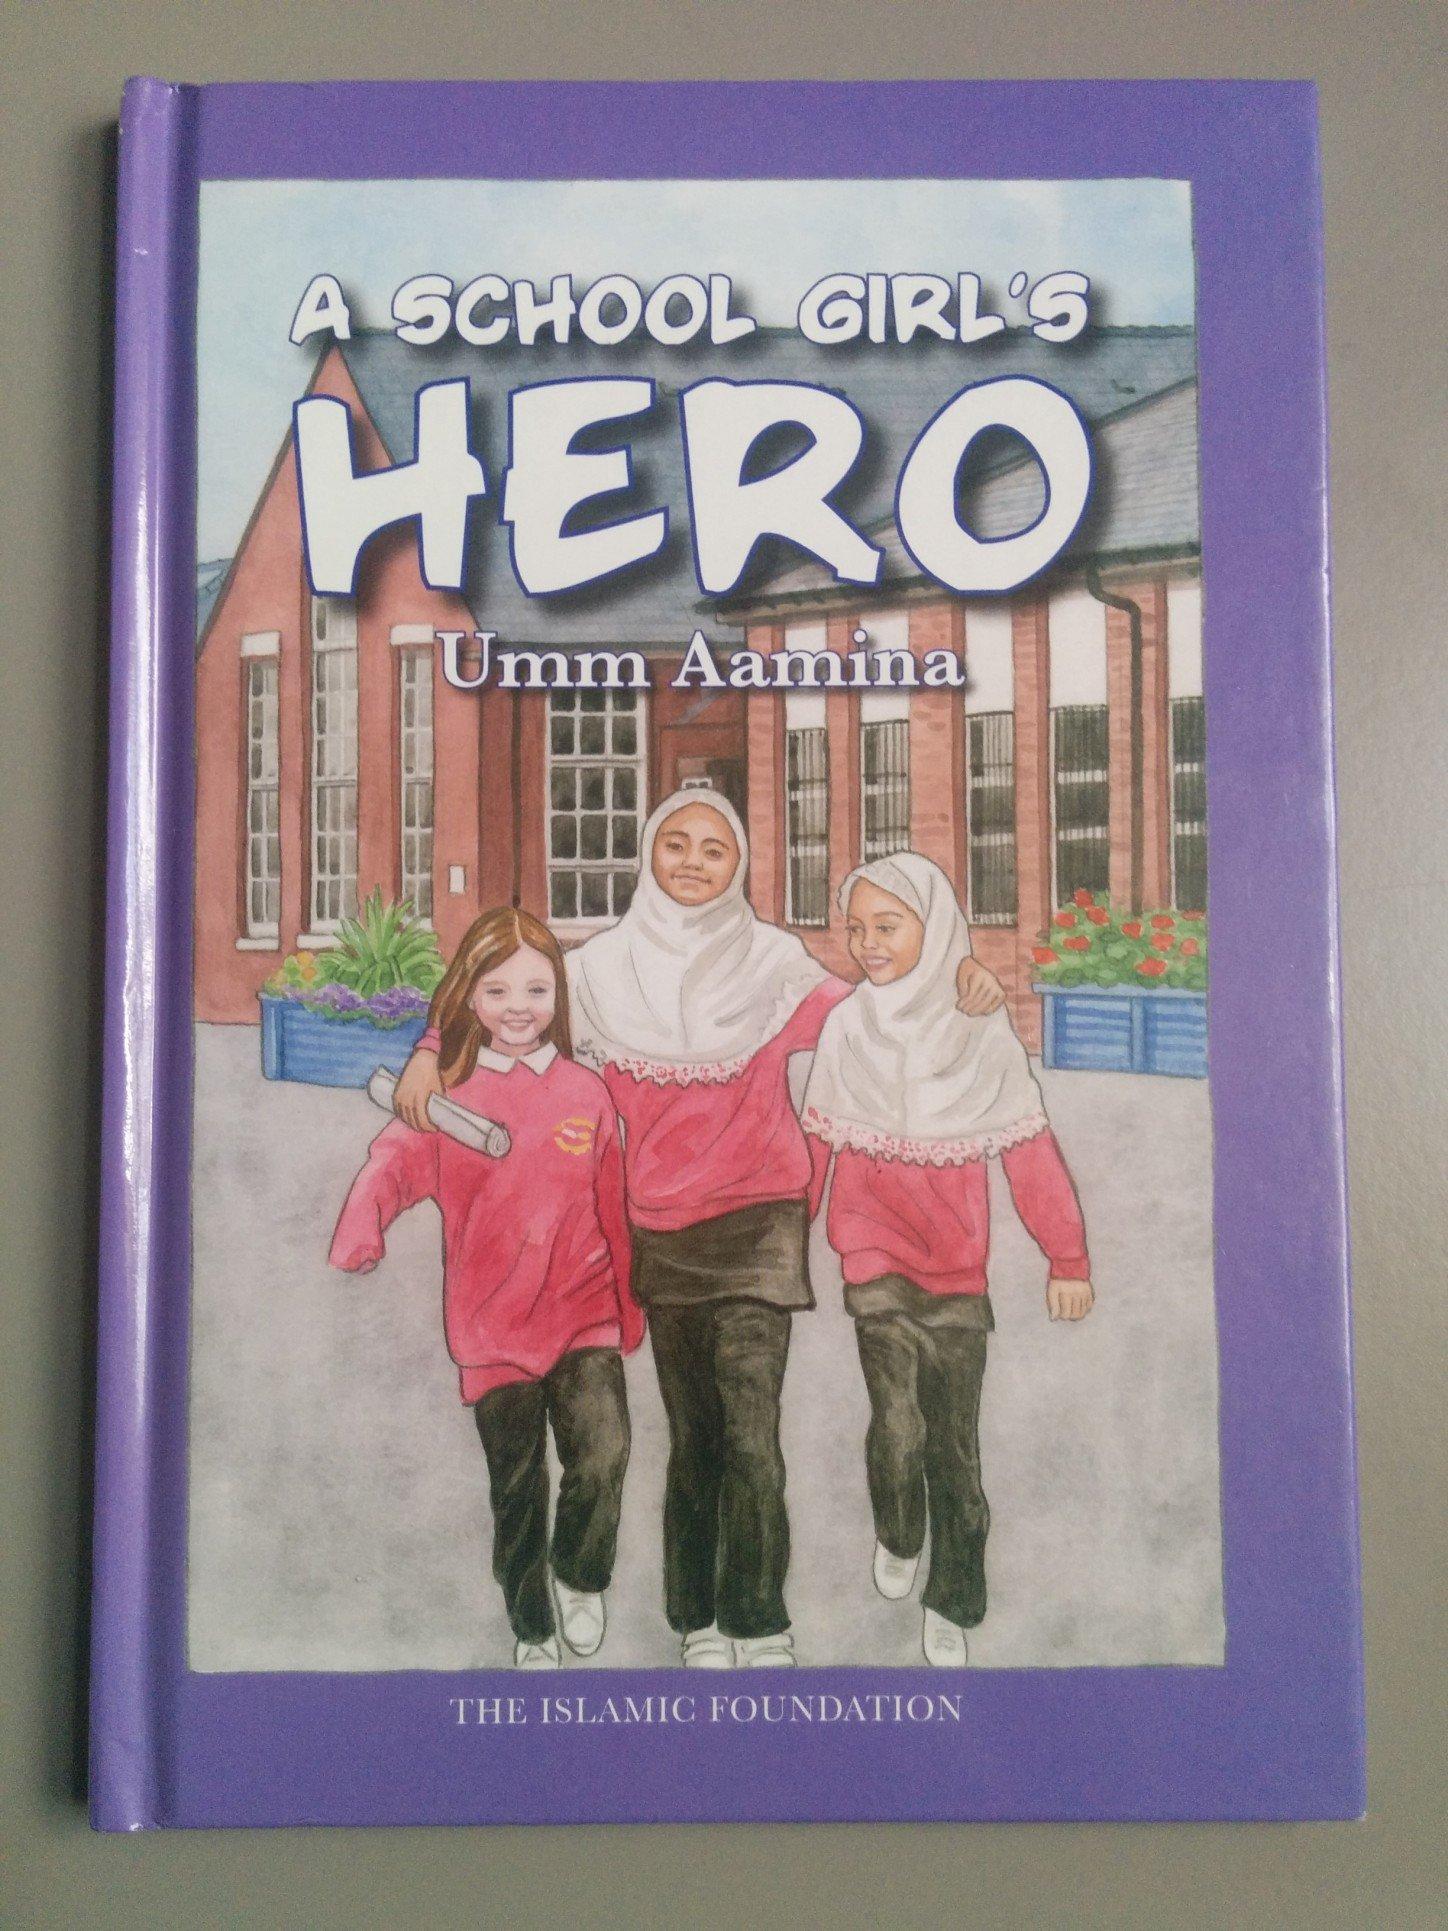 Book Review: A School Girl's Hero